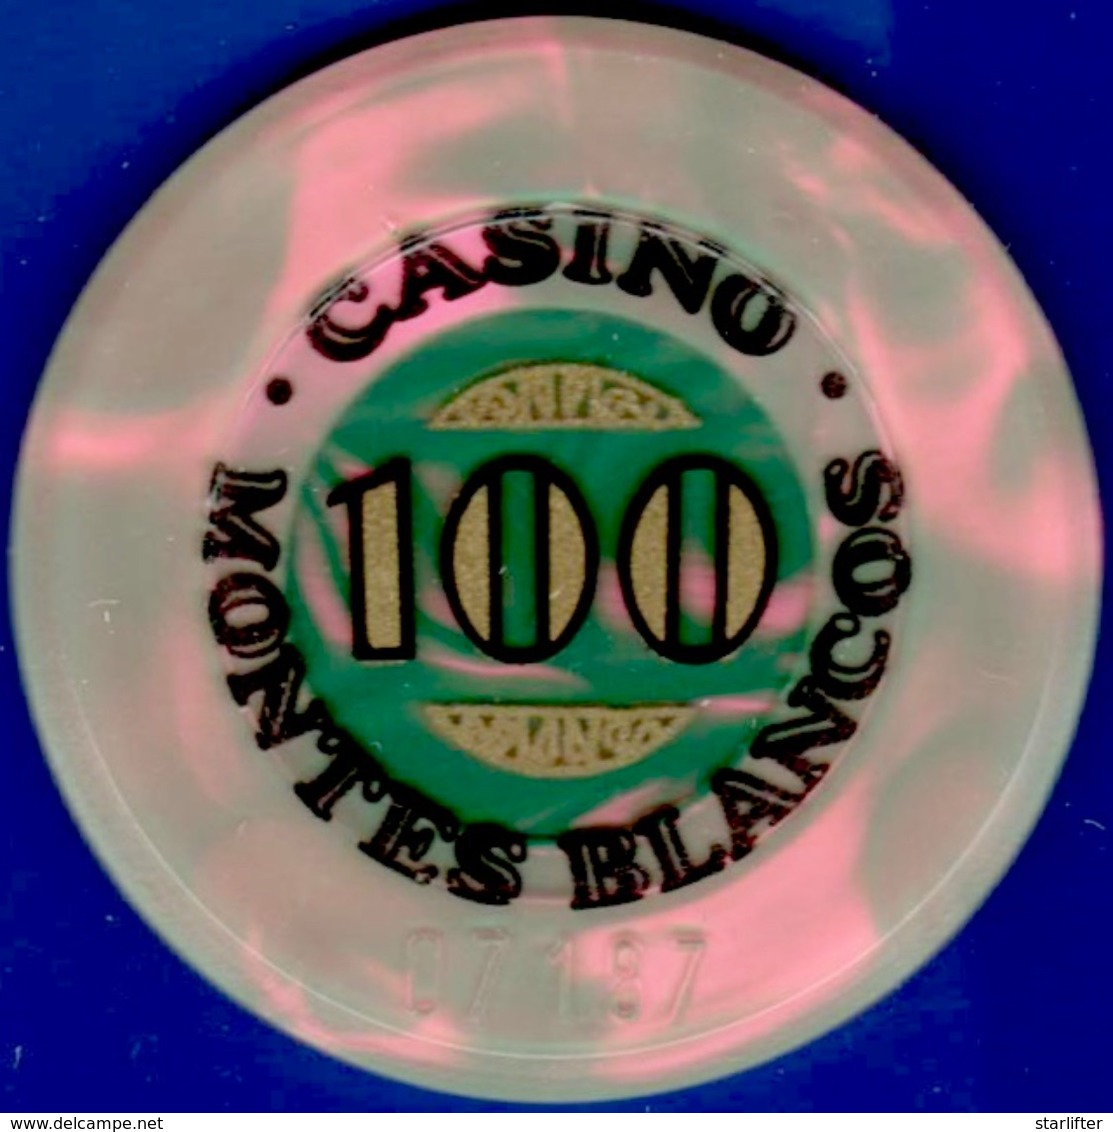 100 Pesetas Casino Chip. Casino Montes Blancos, Zaragosa, Spain. L17. - Casino